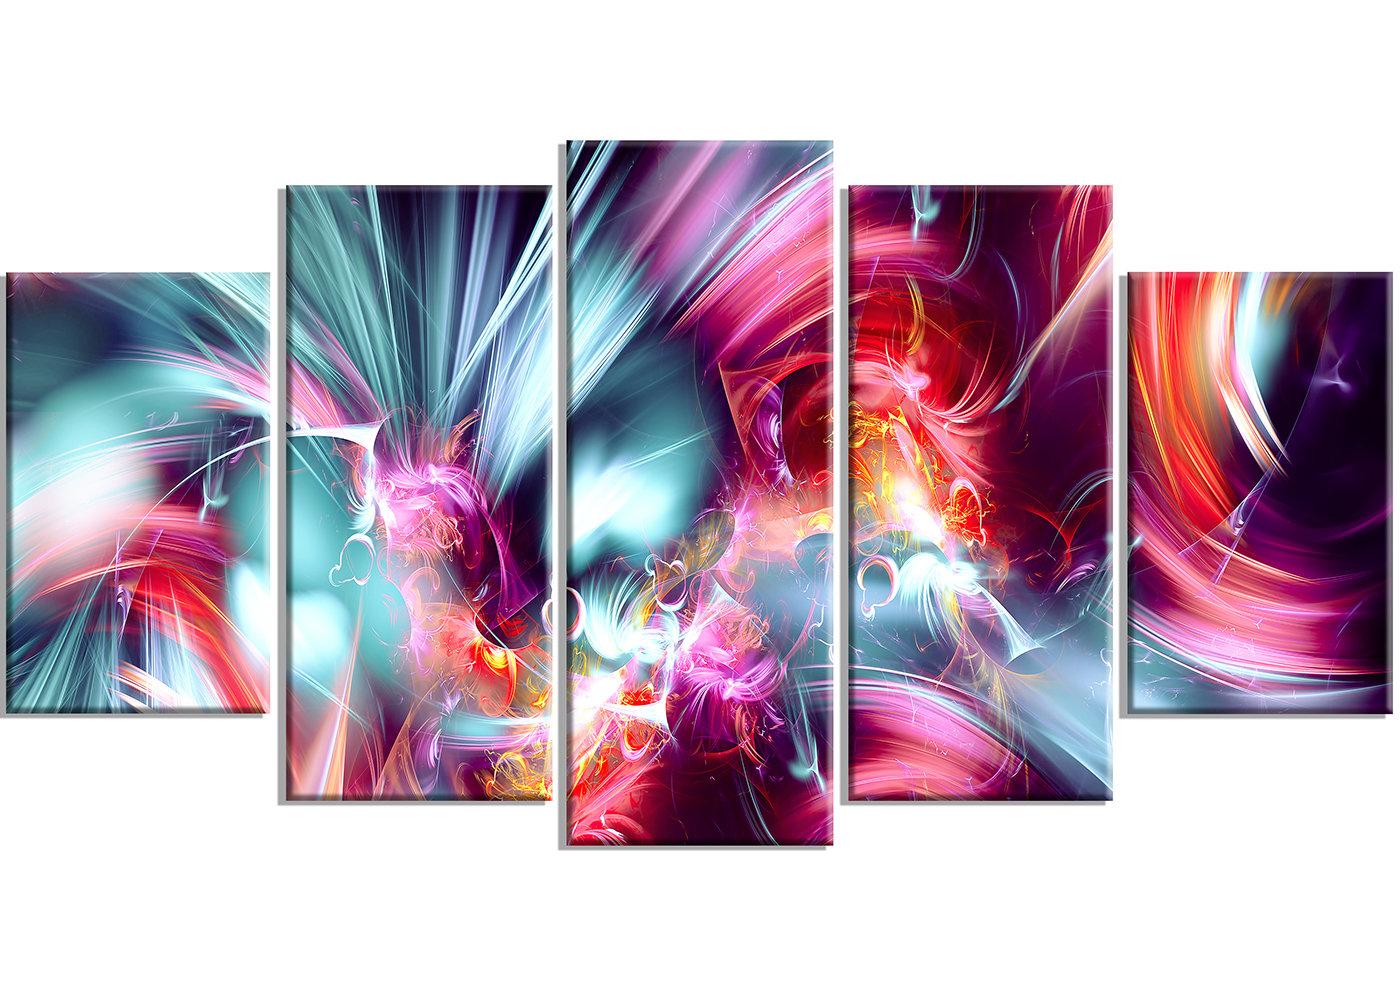 Designart Take Me Over 5 Piece Graphic Art On Wrapped Canvas Set Reviews Wayfair